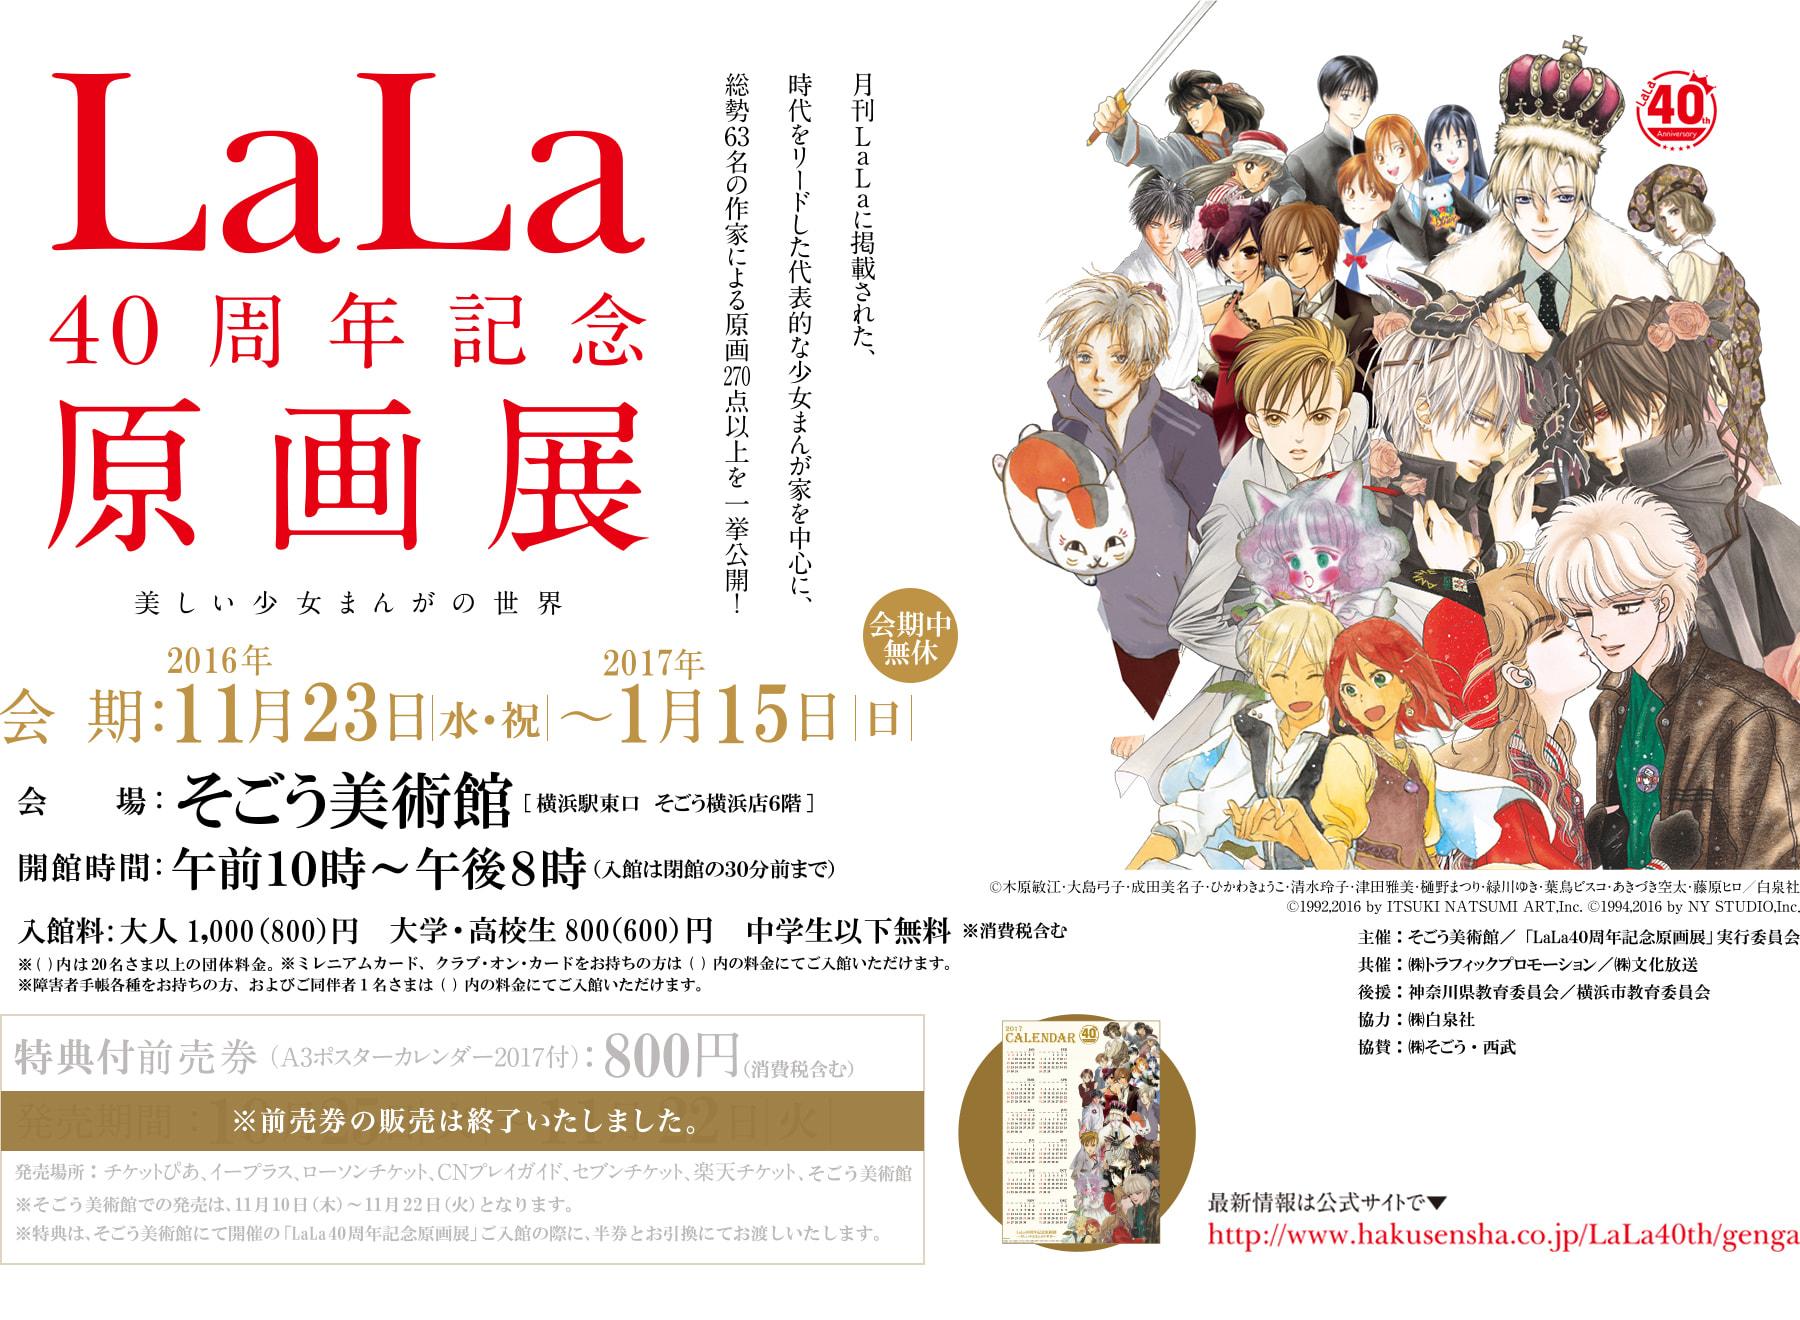 LaLa40周年記念原画展 美しい少女まんがの世界 そごう美術館